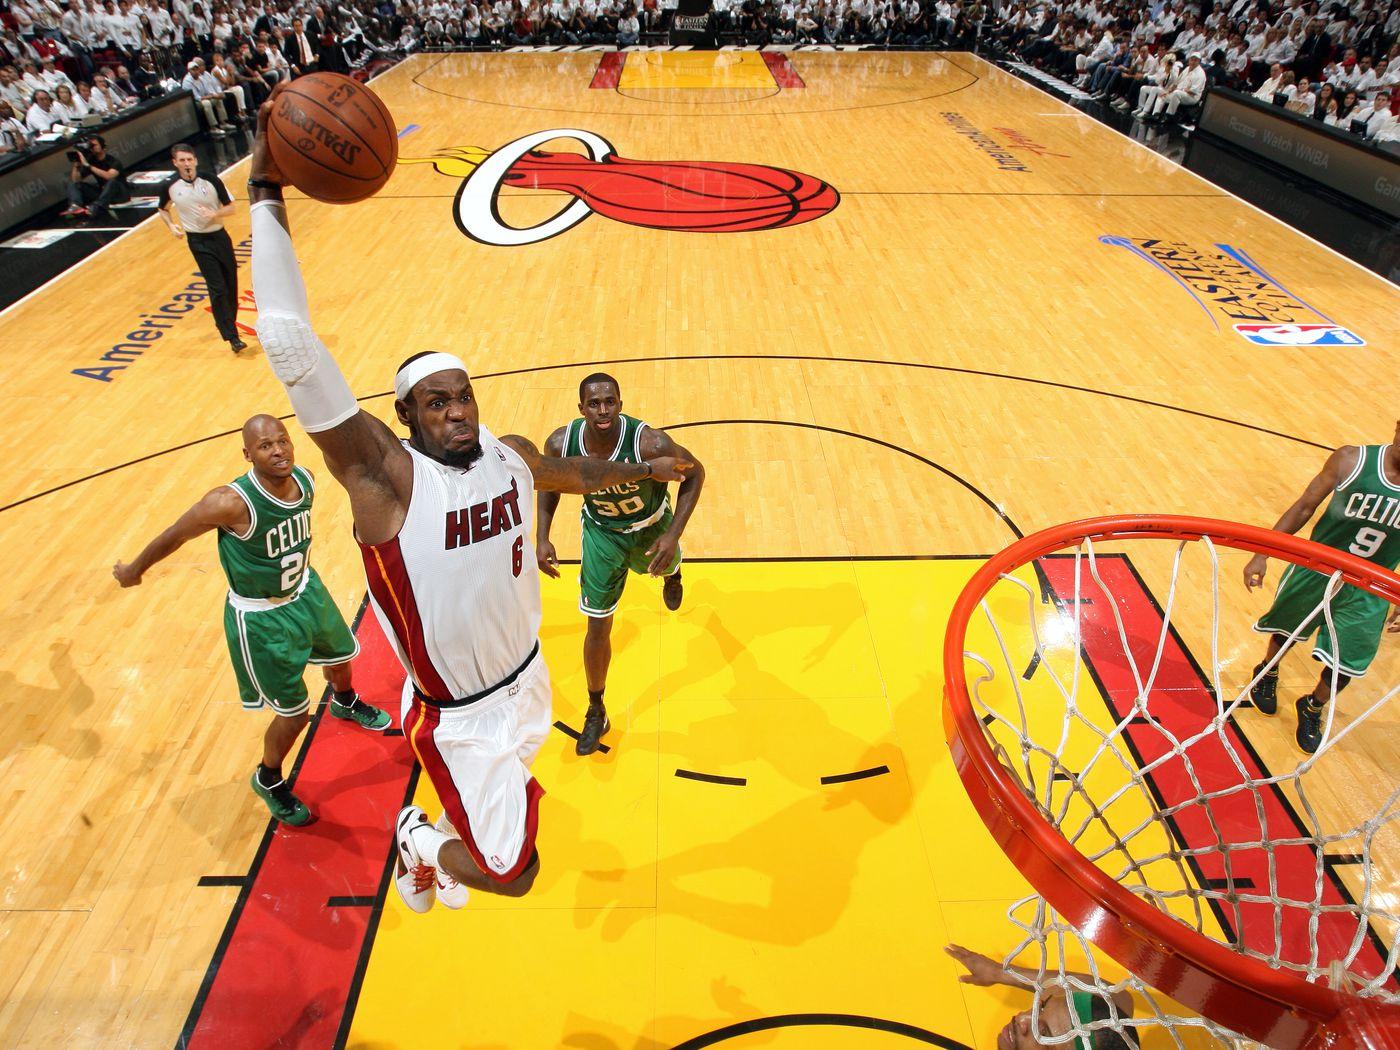 Rewind Big Three Heat Vanquish Celtics In Game 7 Hot Hot Hoops